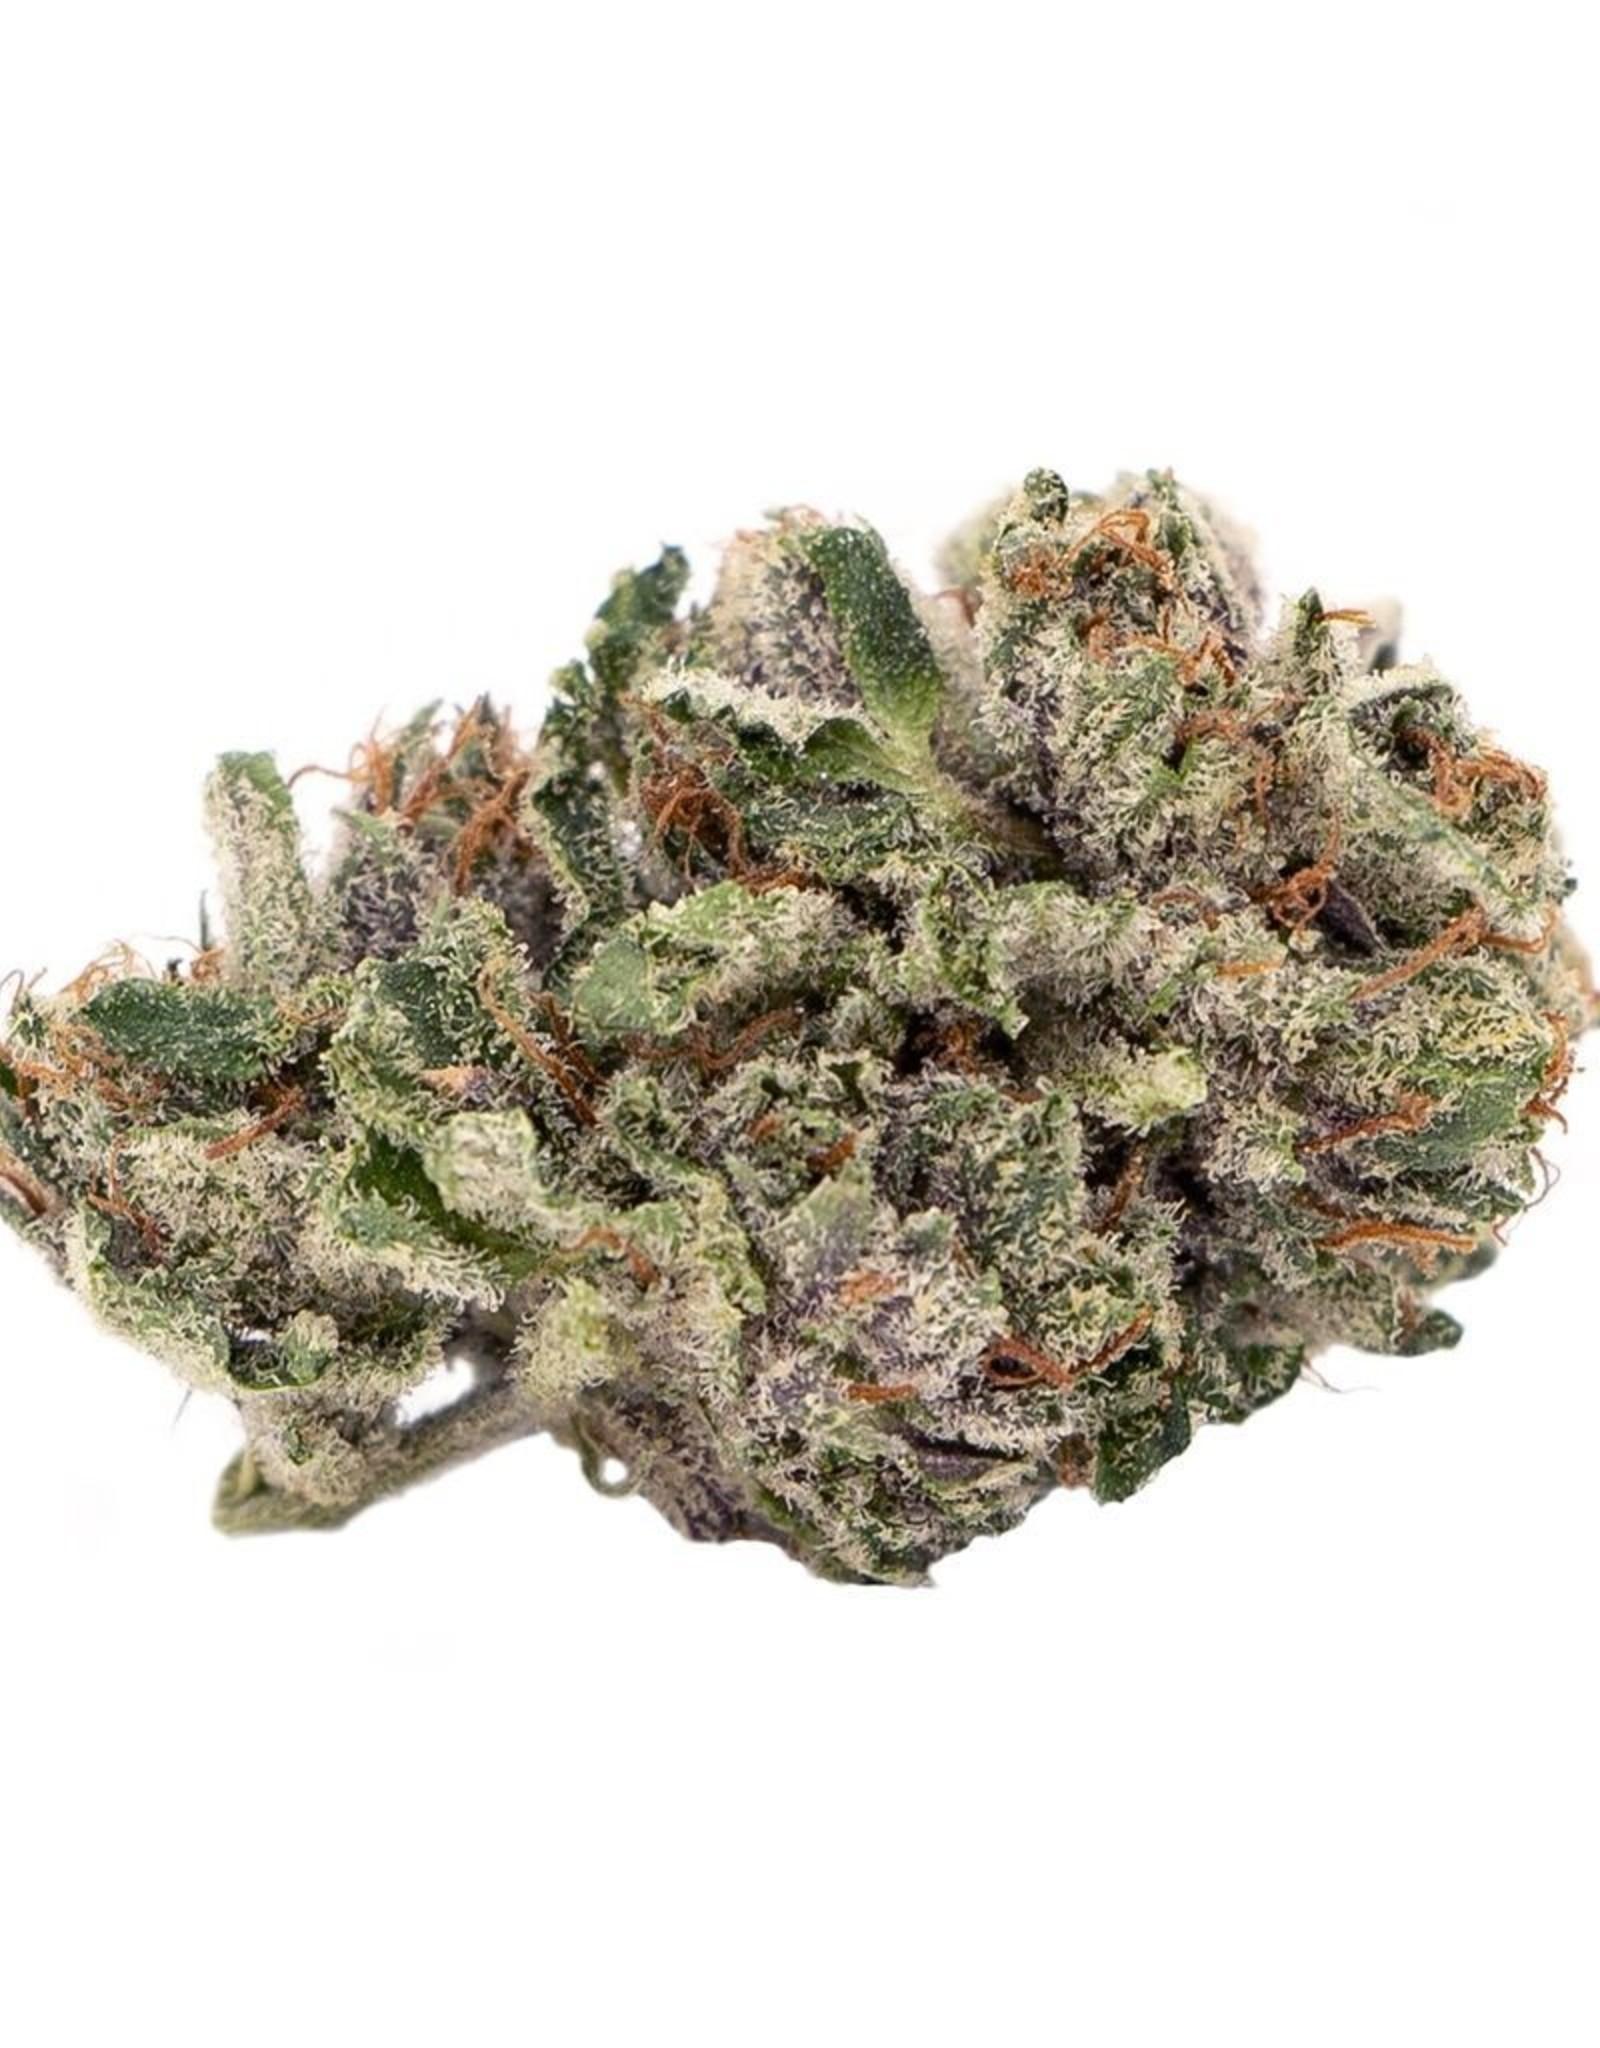 Artisan Batch Artisan Batch - Dunn Cannabis Screwhead - 3.5G